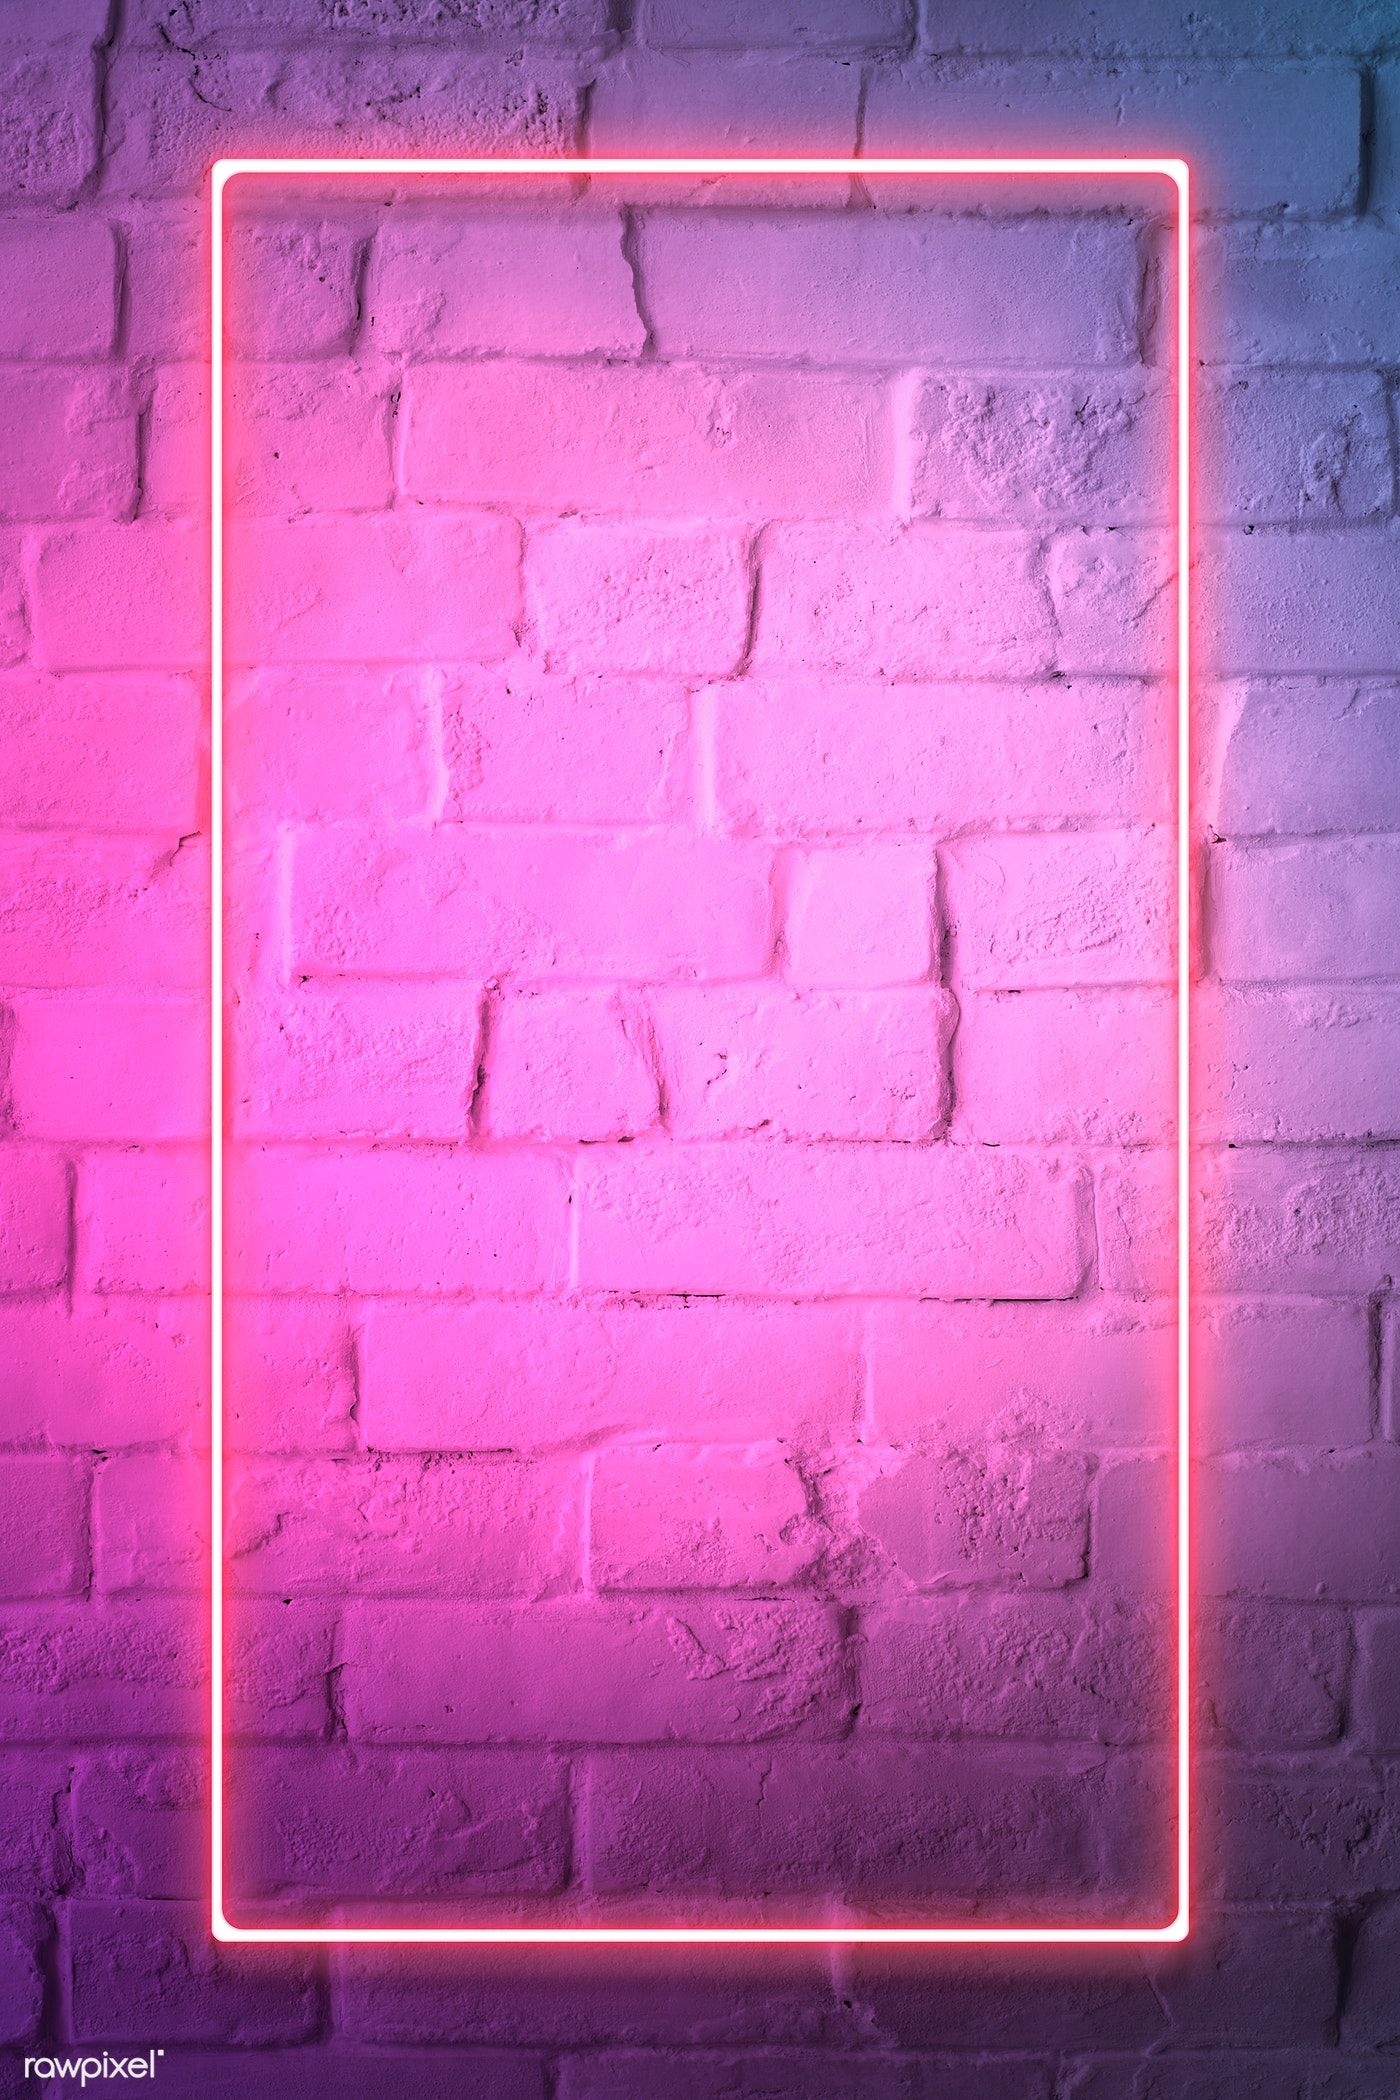 Download Premium Illustration Of Pink Neon Lights Frame On A White Brick Pink Neon Lights Neon Light Wallpaper Neon Wallpaper